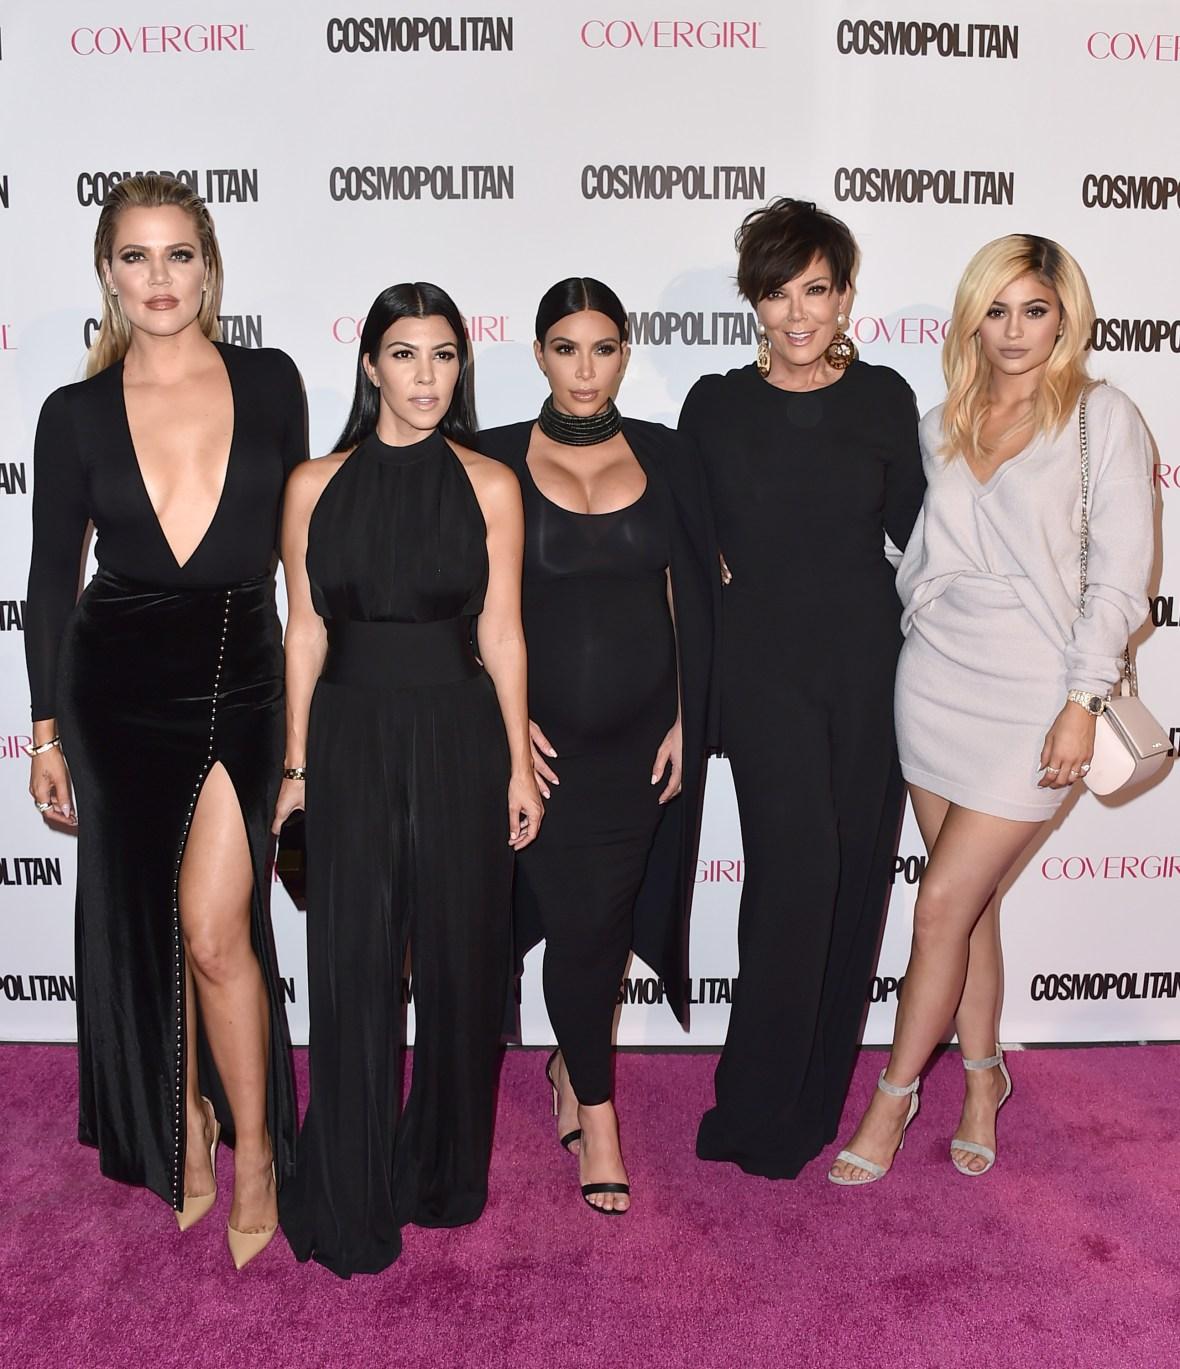 Photos of All the Kardashian-Jenners Together: Kim, Kylie, Khloe, Kourtney Kendall 2